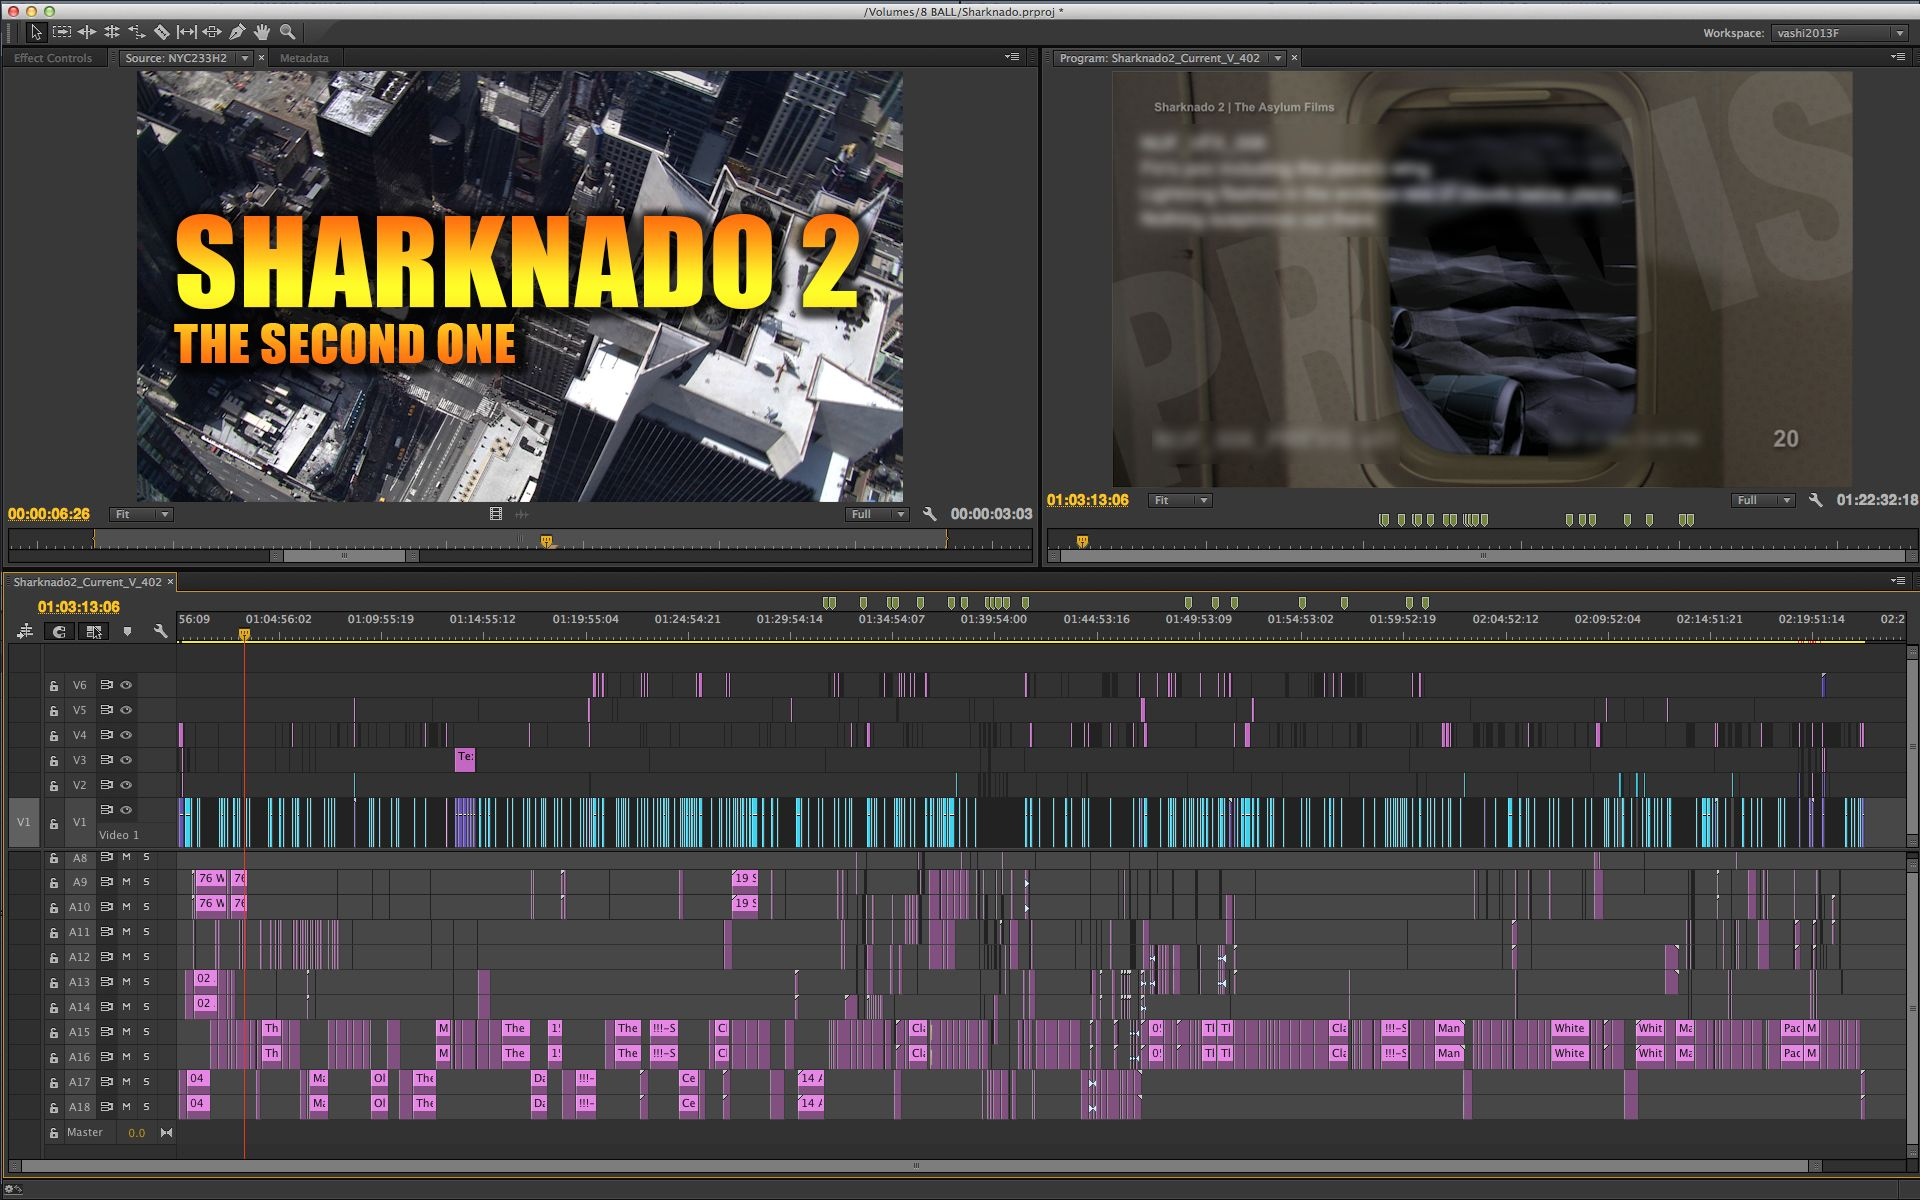 SHARKNADO 2 Sneak Peek at the First Edit Blog